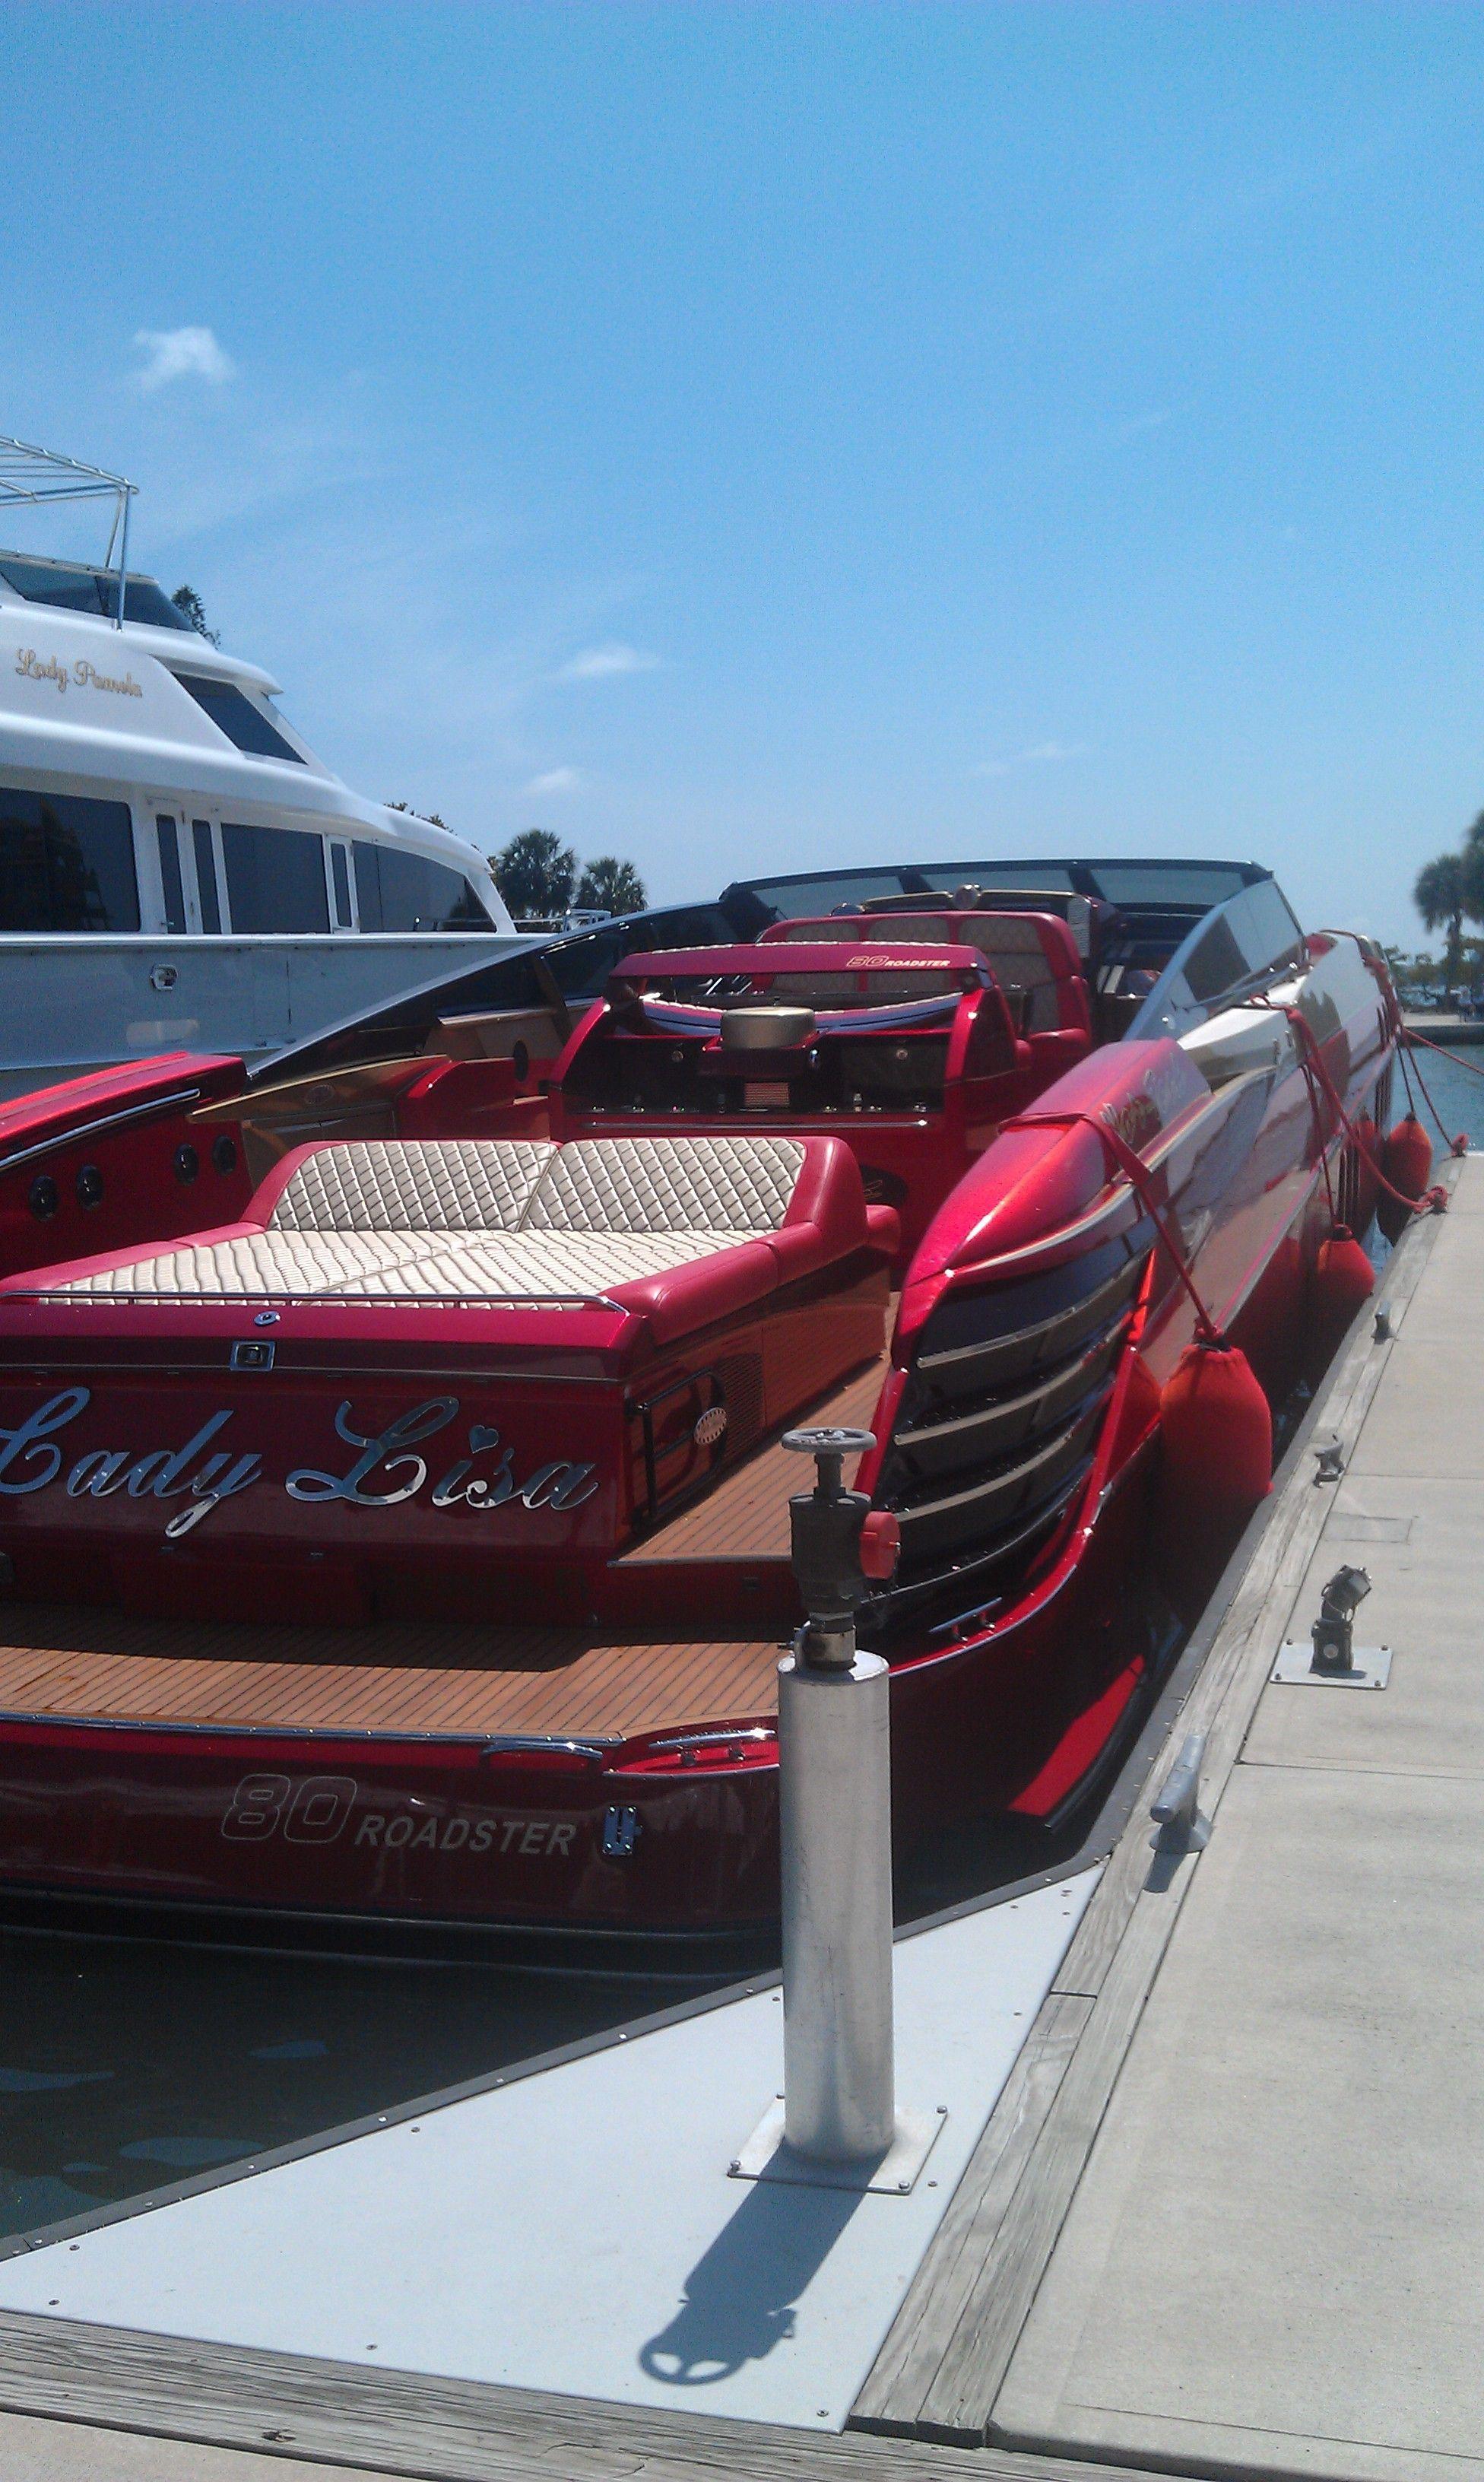 Lady Lisa 80 Foot Speedboat Sarasota Florida Beautiful In 2020 Boats Luxury Yacht Design Luxury Yachts